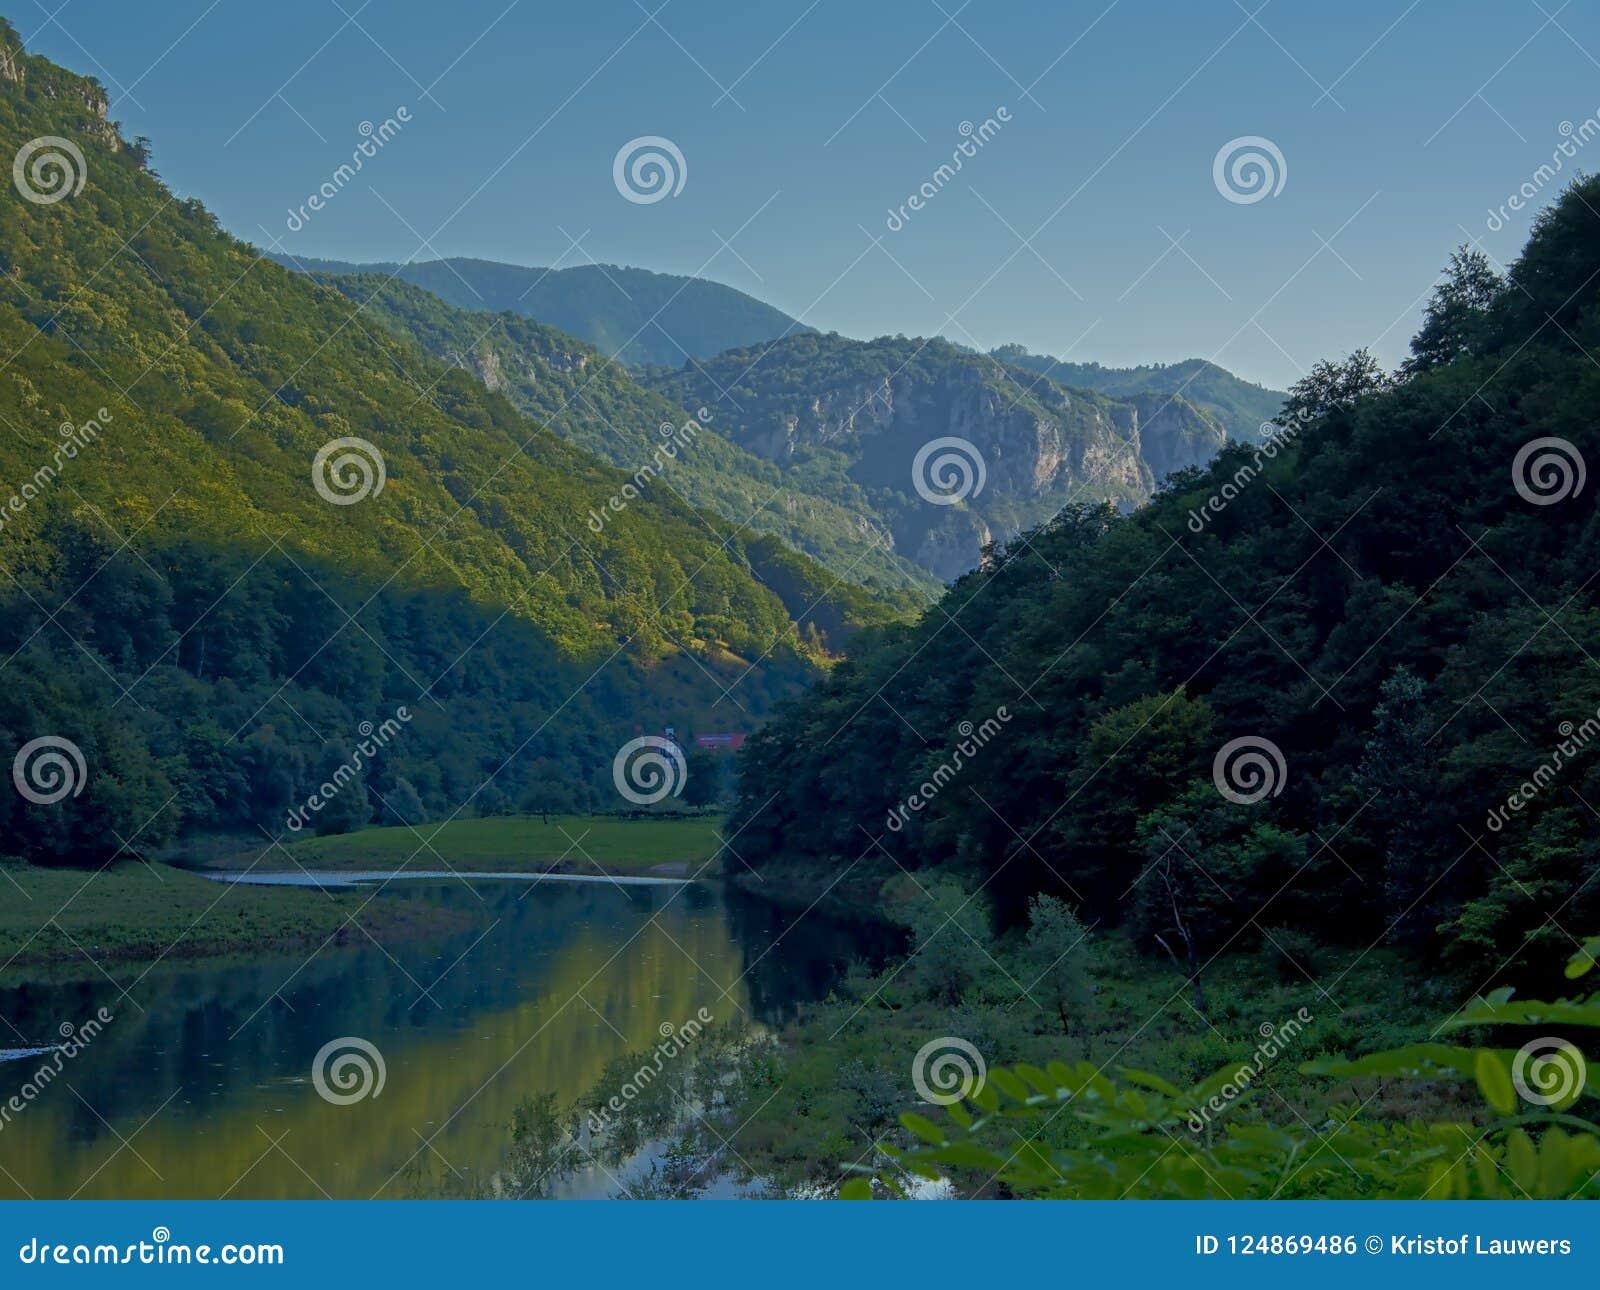 River Danube flowing in Romanian mountain landscape in early morning light